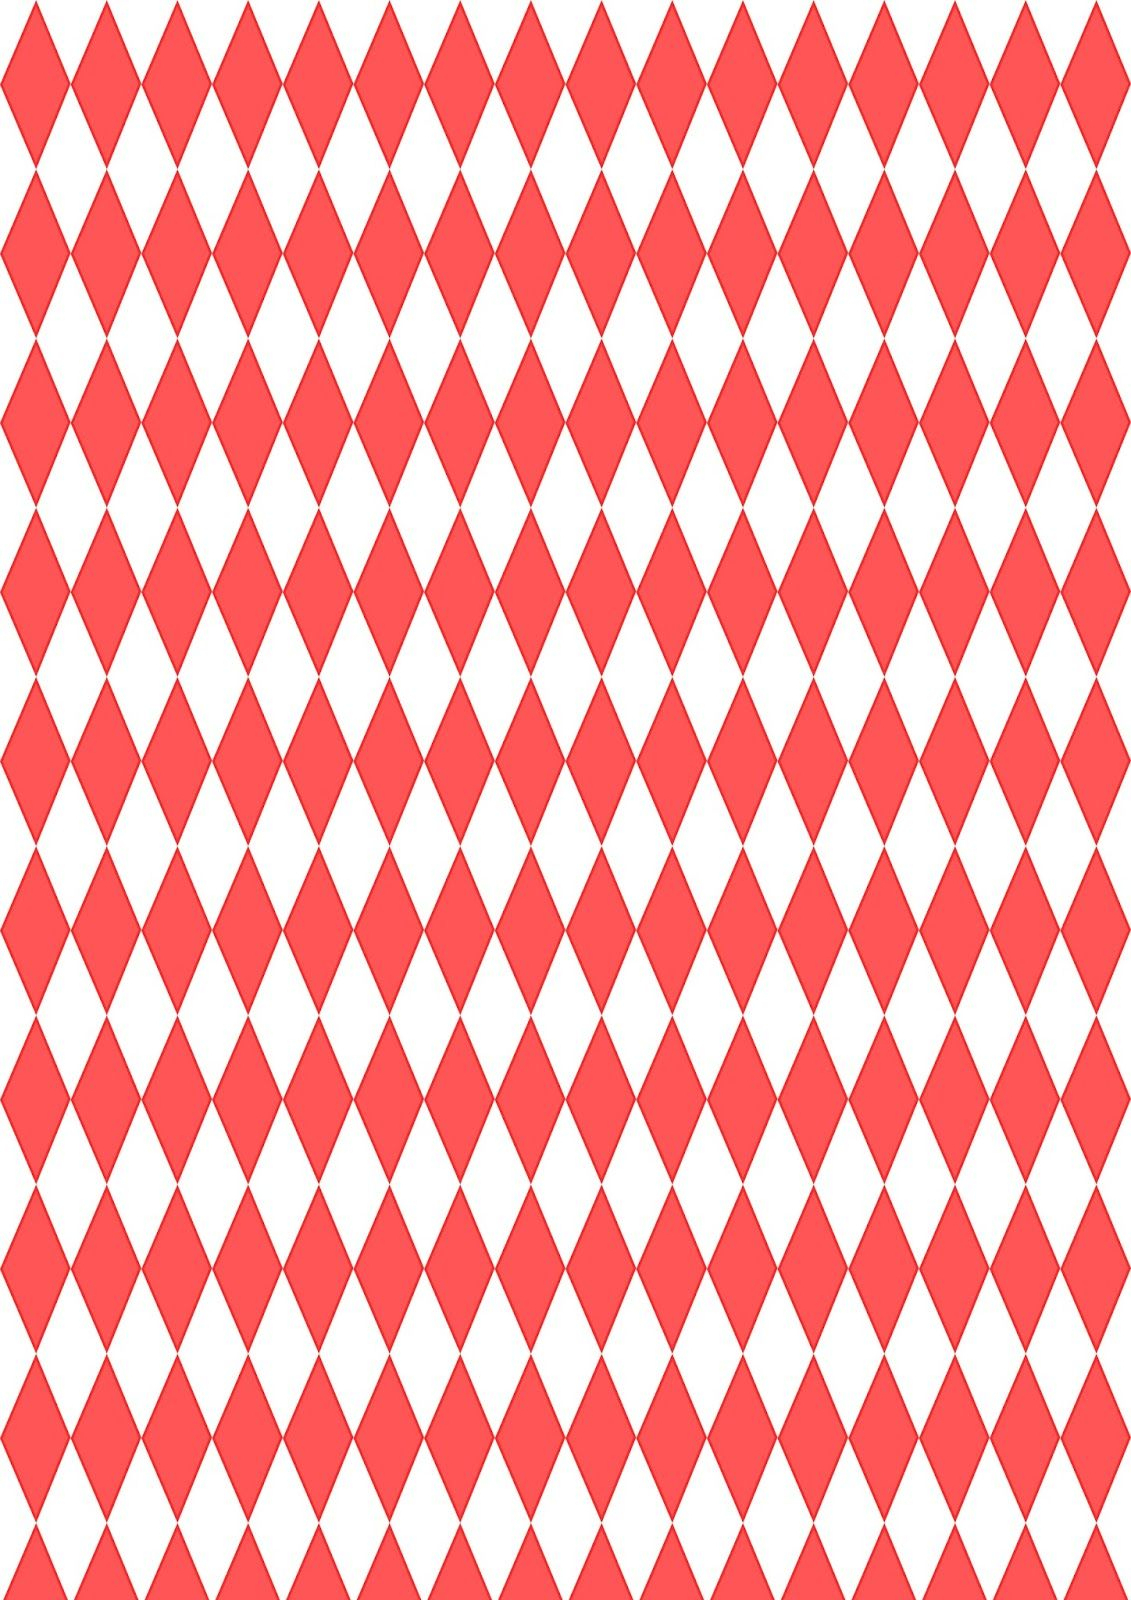 Free Digital Red Harlequin Scrapbooking Paper - Ausdruckbares - Free Printable Pattern Paper Sheets